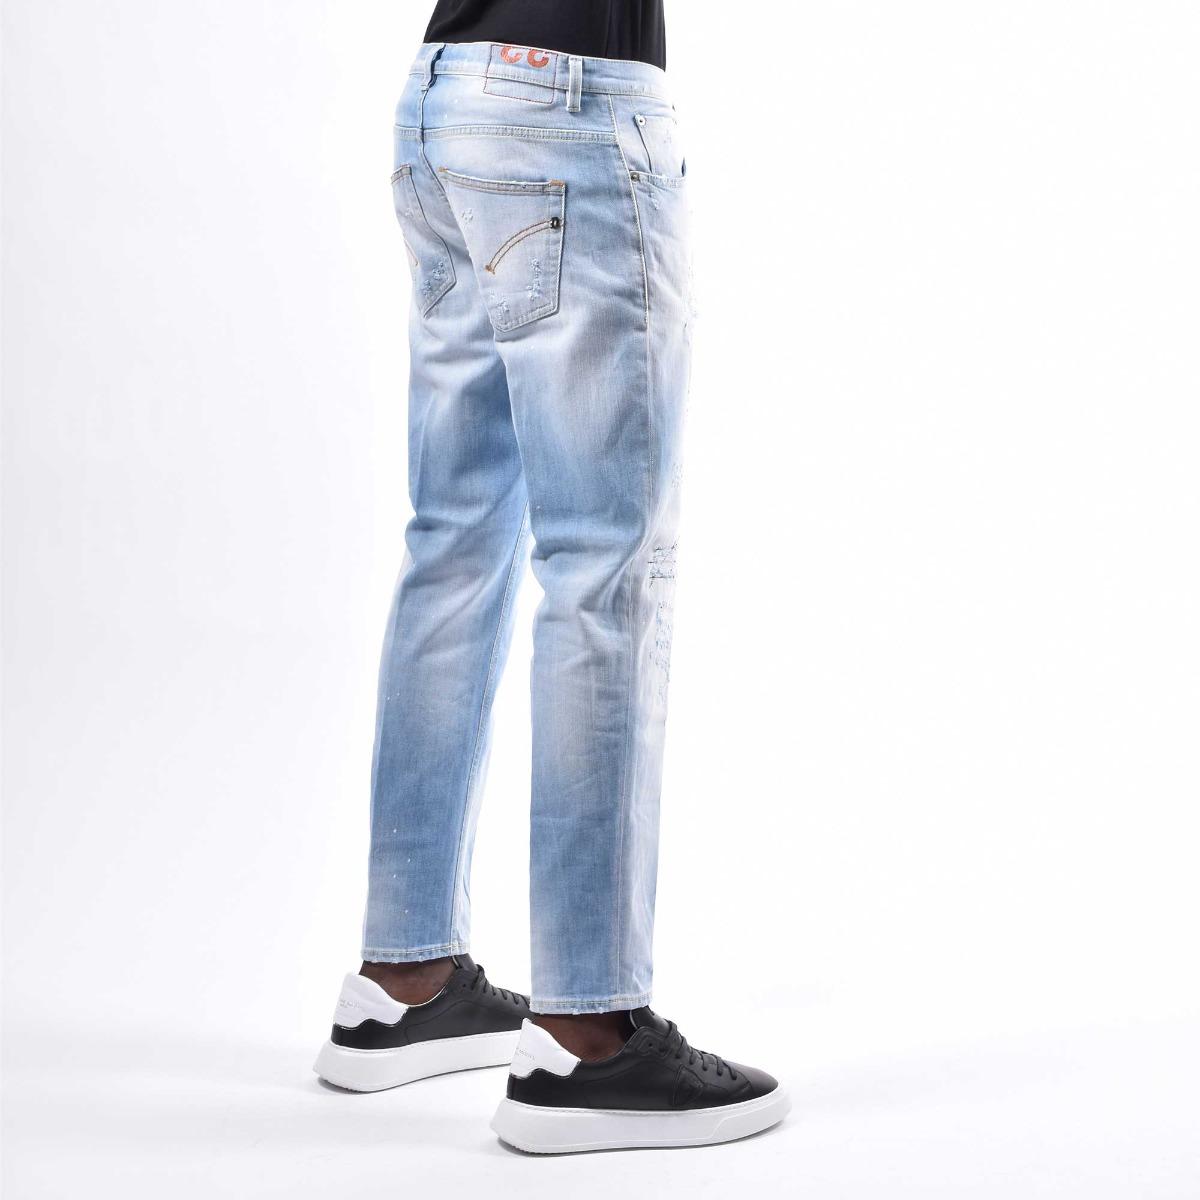 Jeans brighton rotture - Denim chiaro